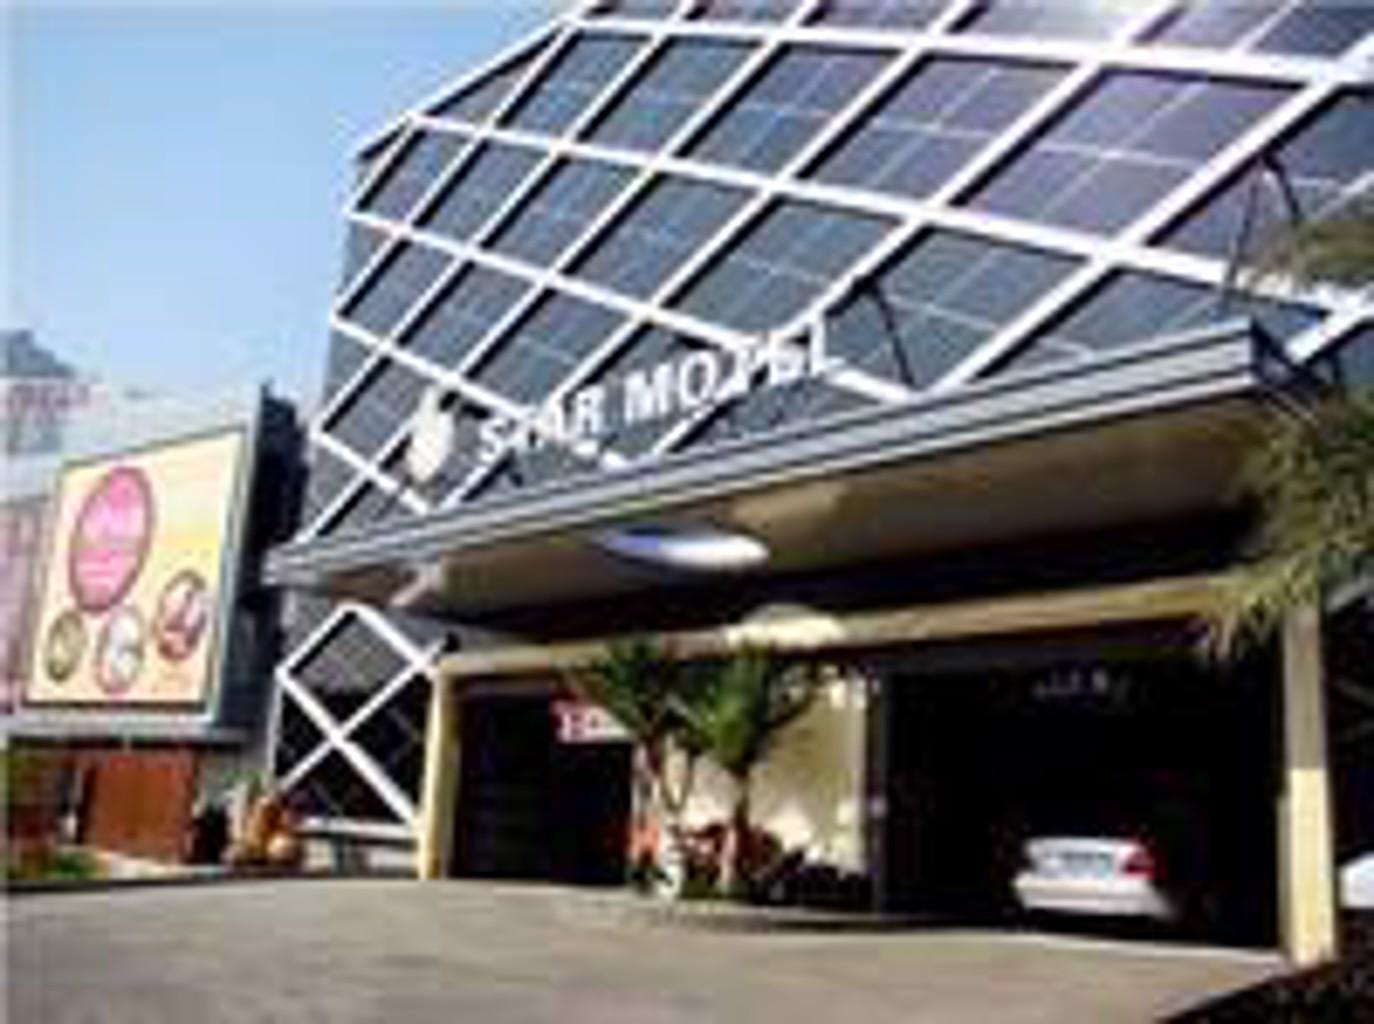 Six Star Motel